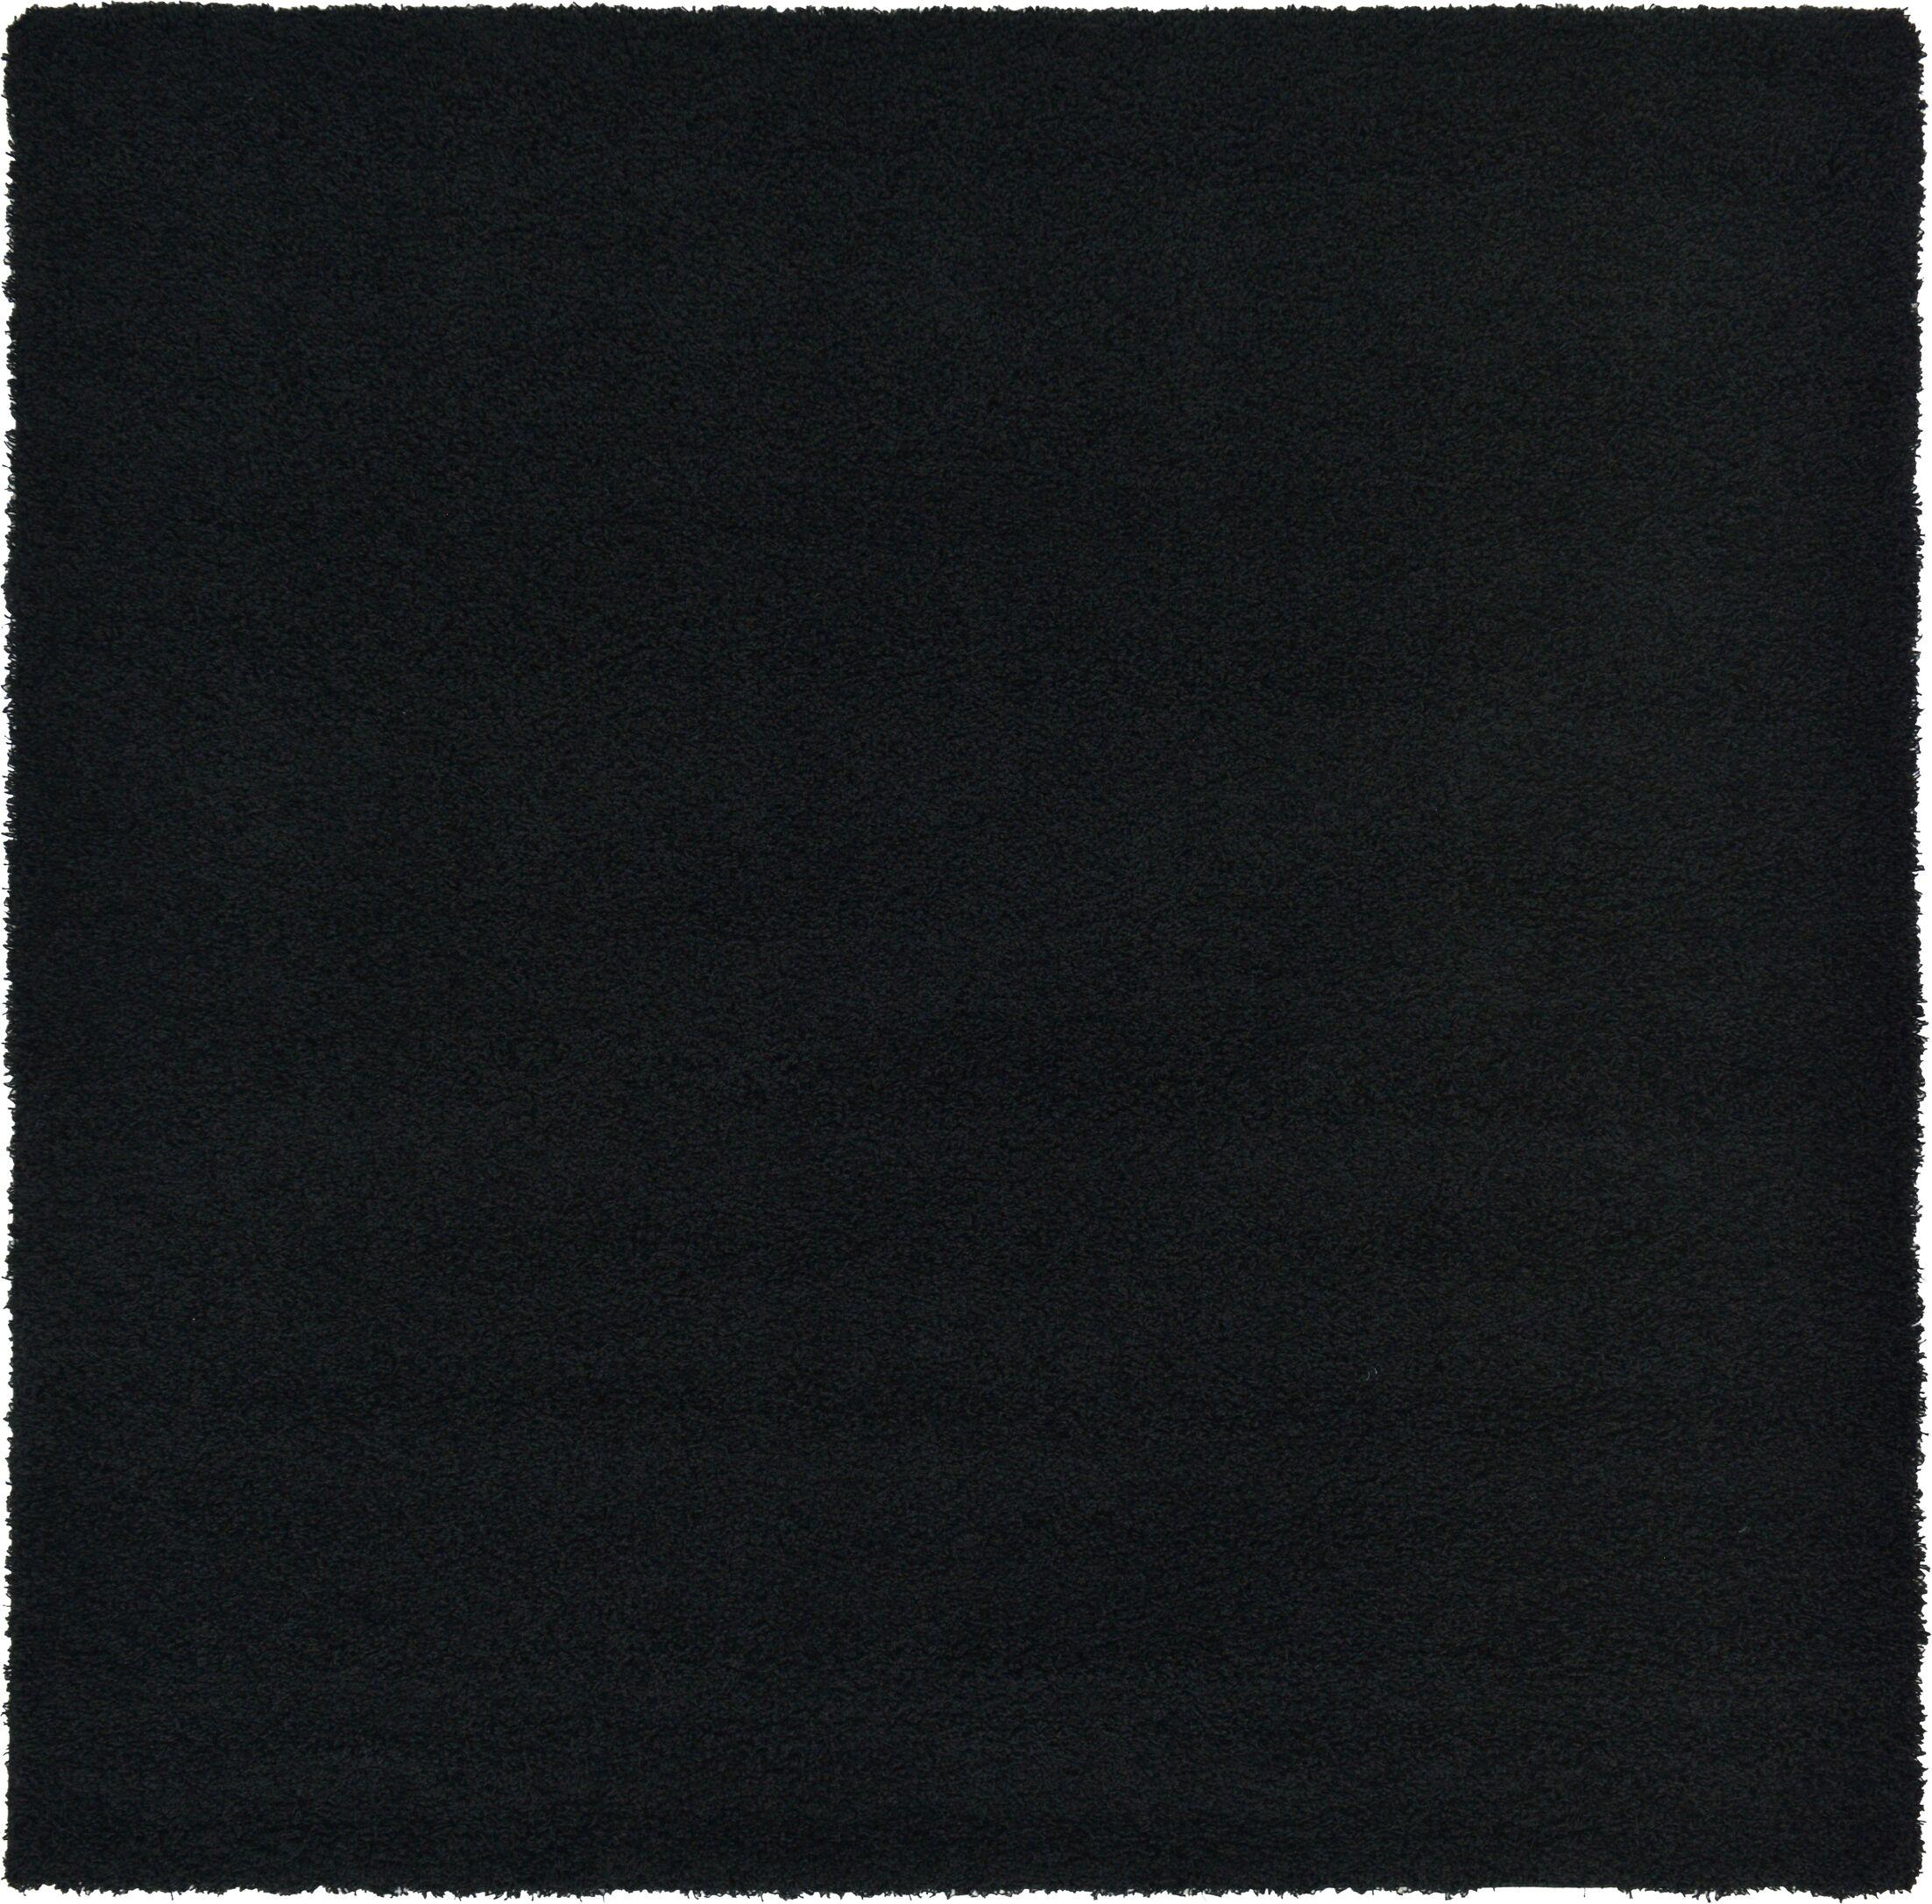 Lilah Black Area Rug Rug Size: Square 8'2